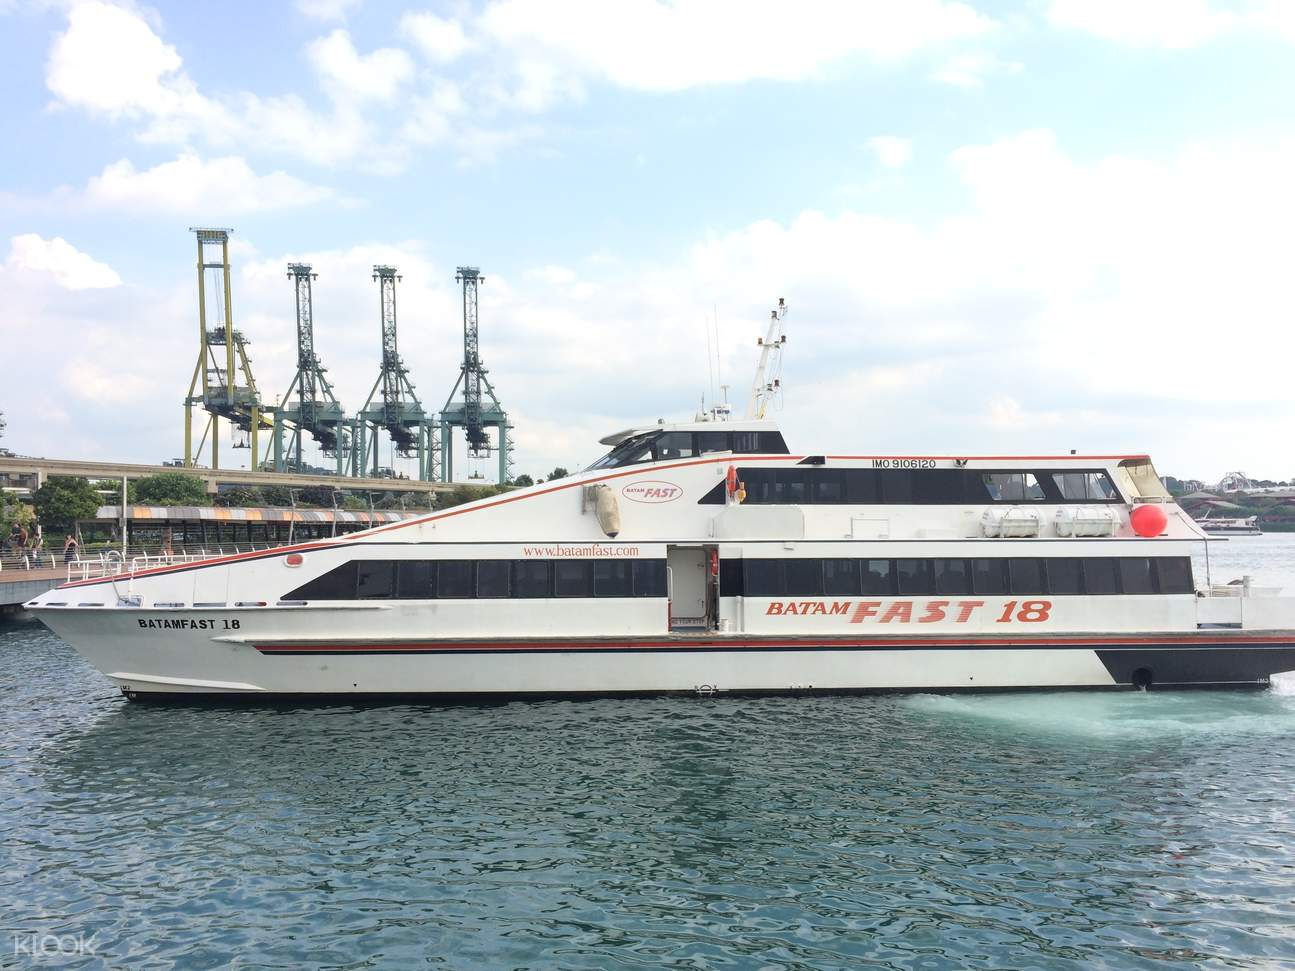 batam fast ferry harbourfront centre